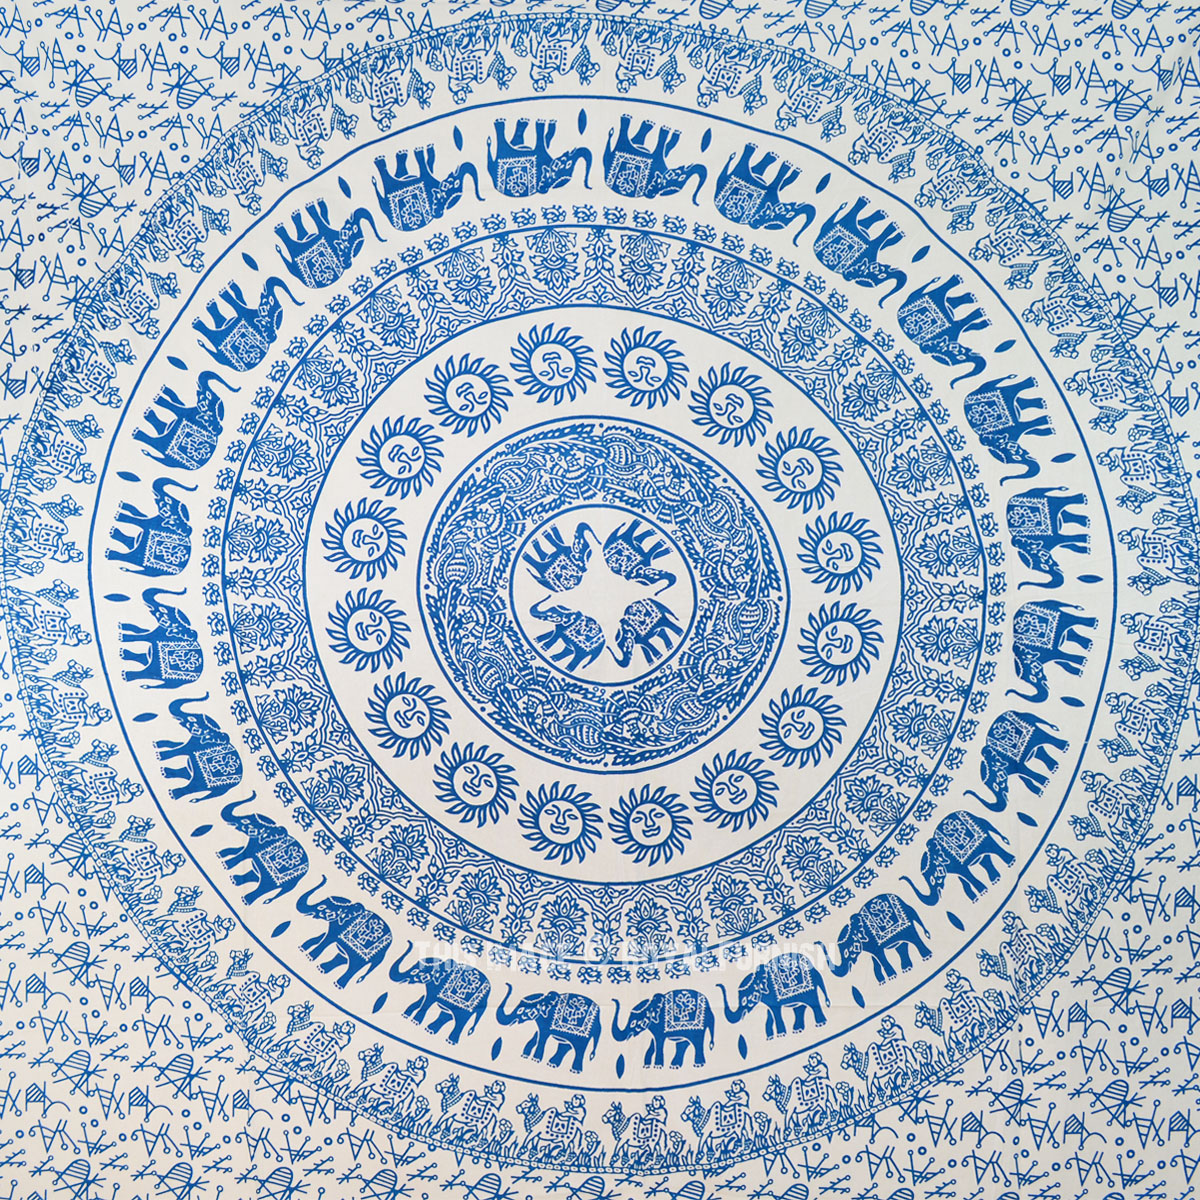 Teal Medallion Wall Decor : Teal elephant sun medallion tapestry fringed cotton